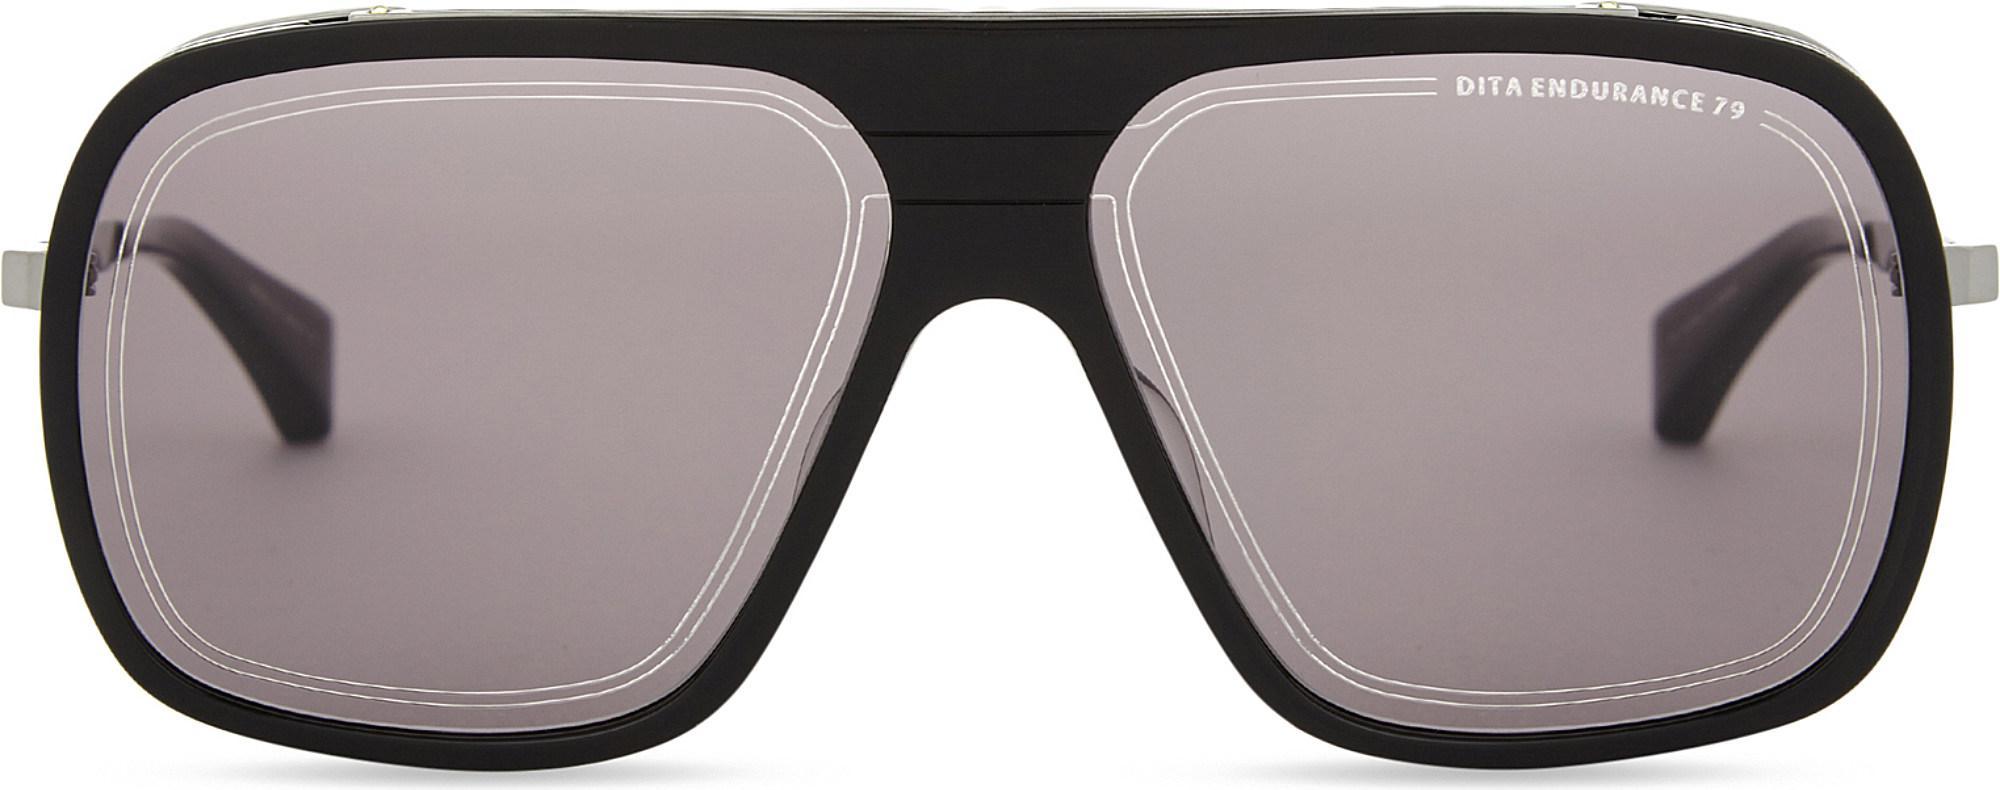 31c3e0ab1f1 DITA Endurance 79 Square-frame Sunglasses in Black - Lyst